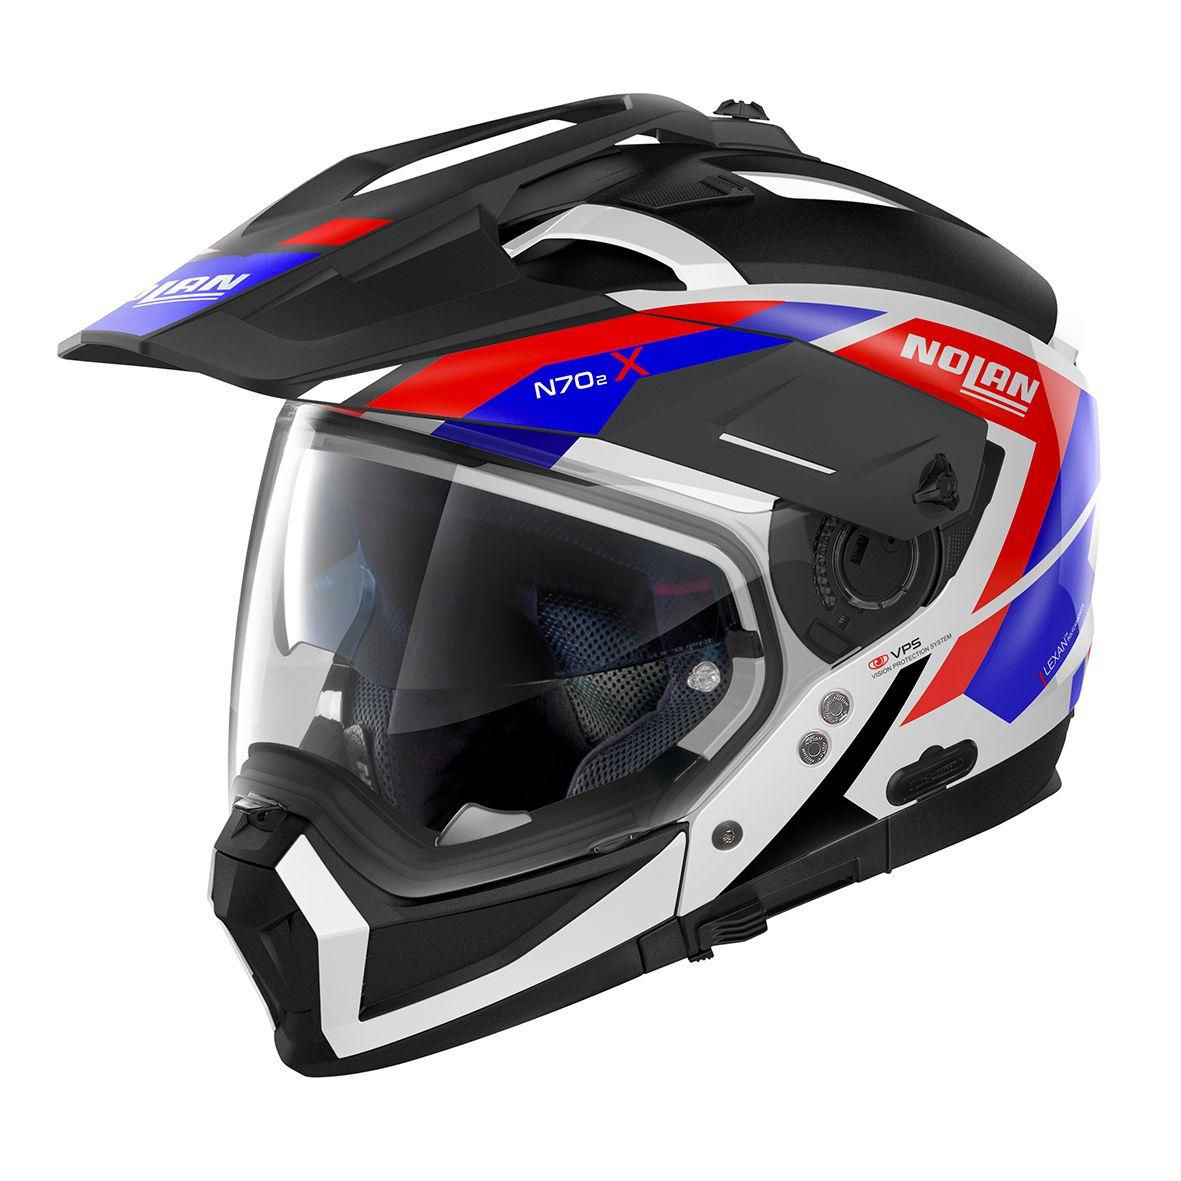 Capacete Nolan N70-2 X Grandes Alpes Tricolor - Big Trail / Off Road  - Nova Suzuki Motos e Acessórios